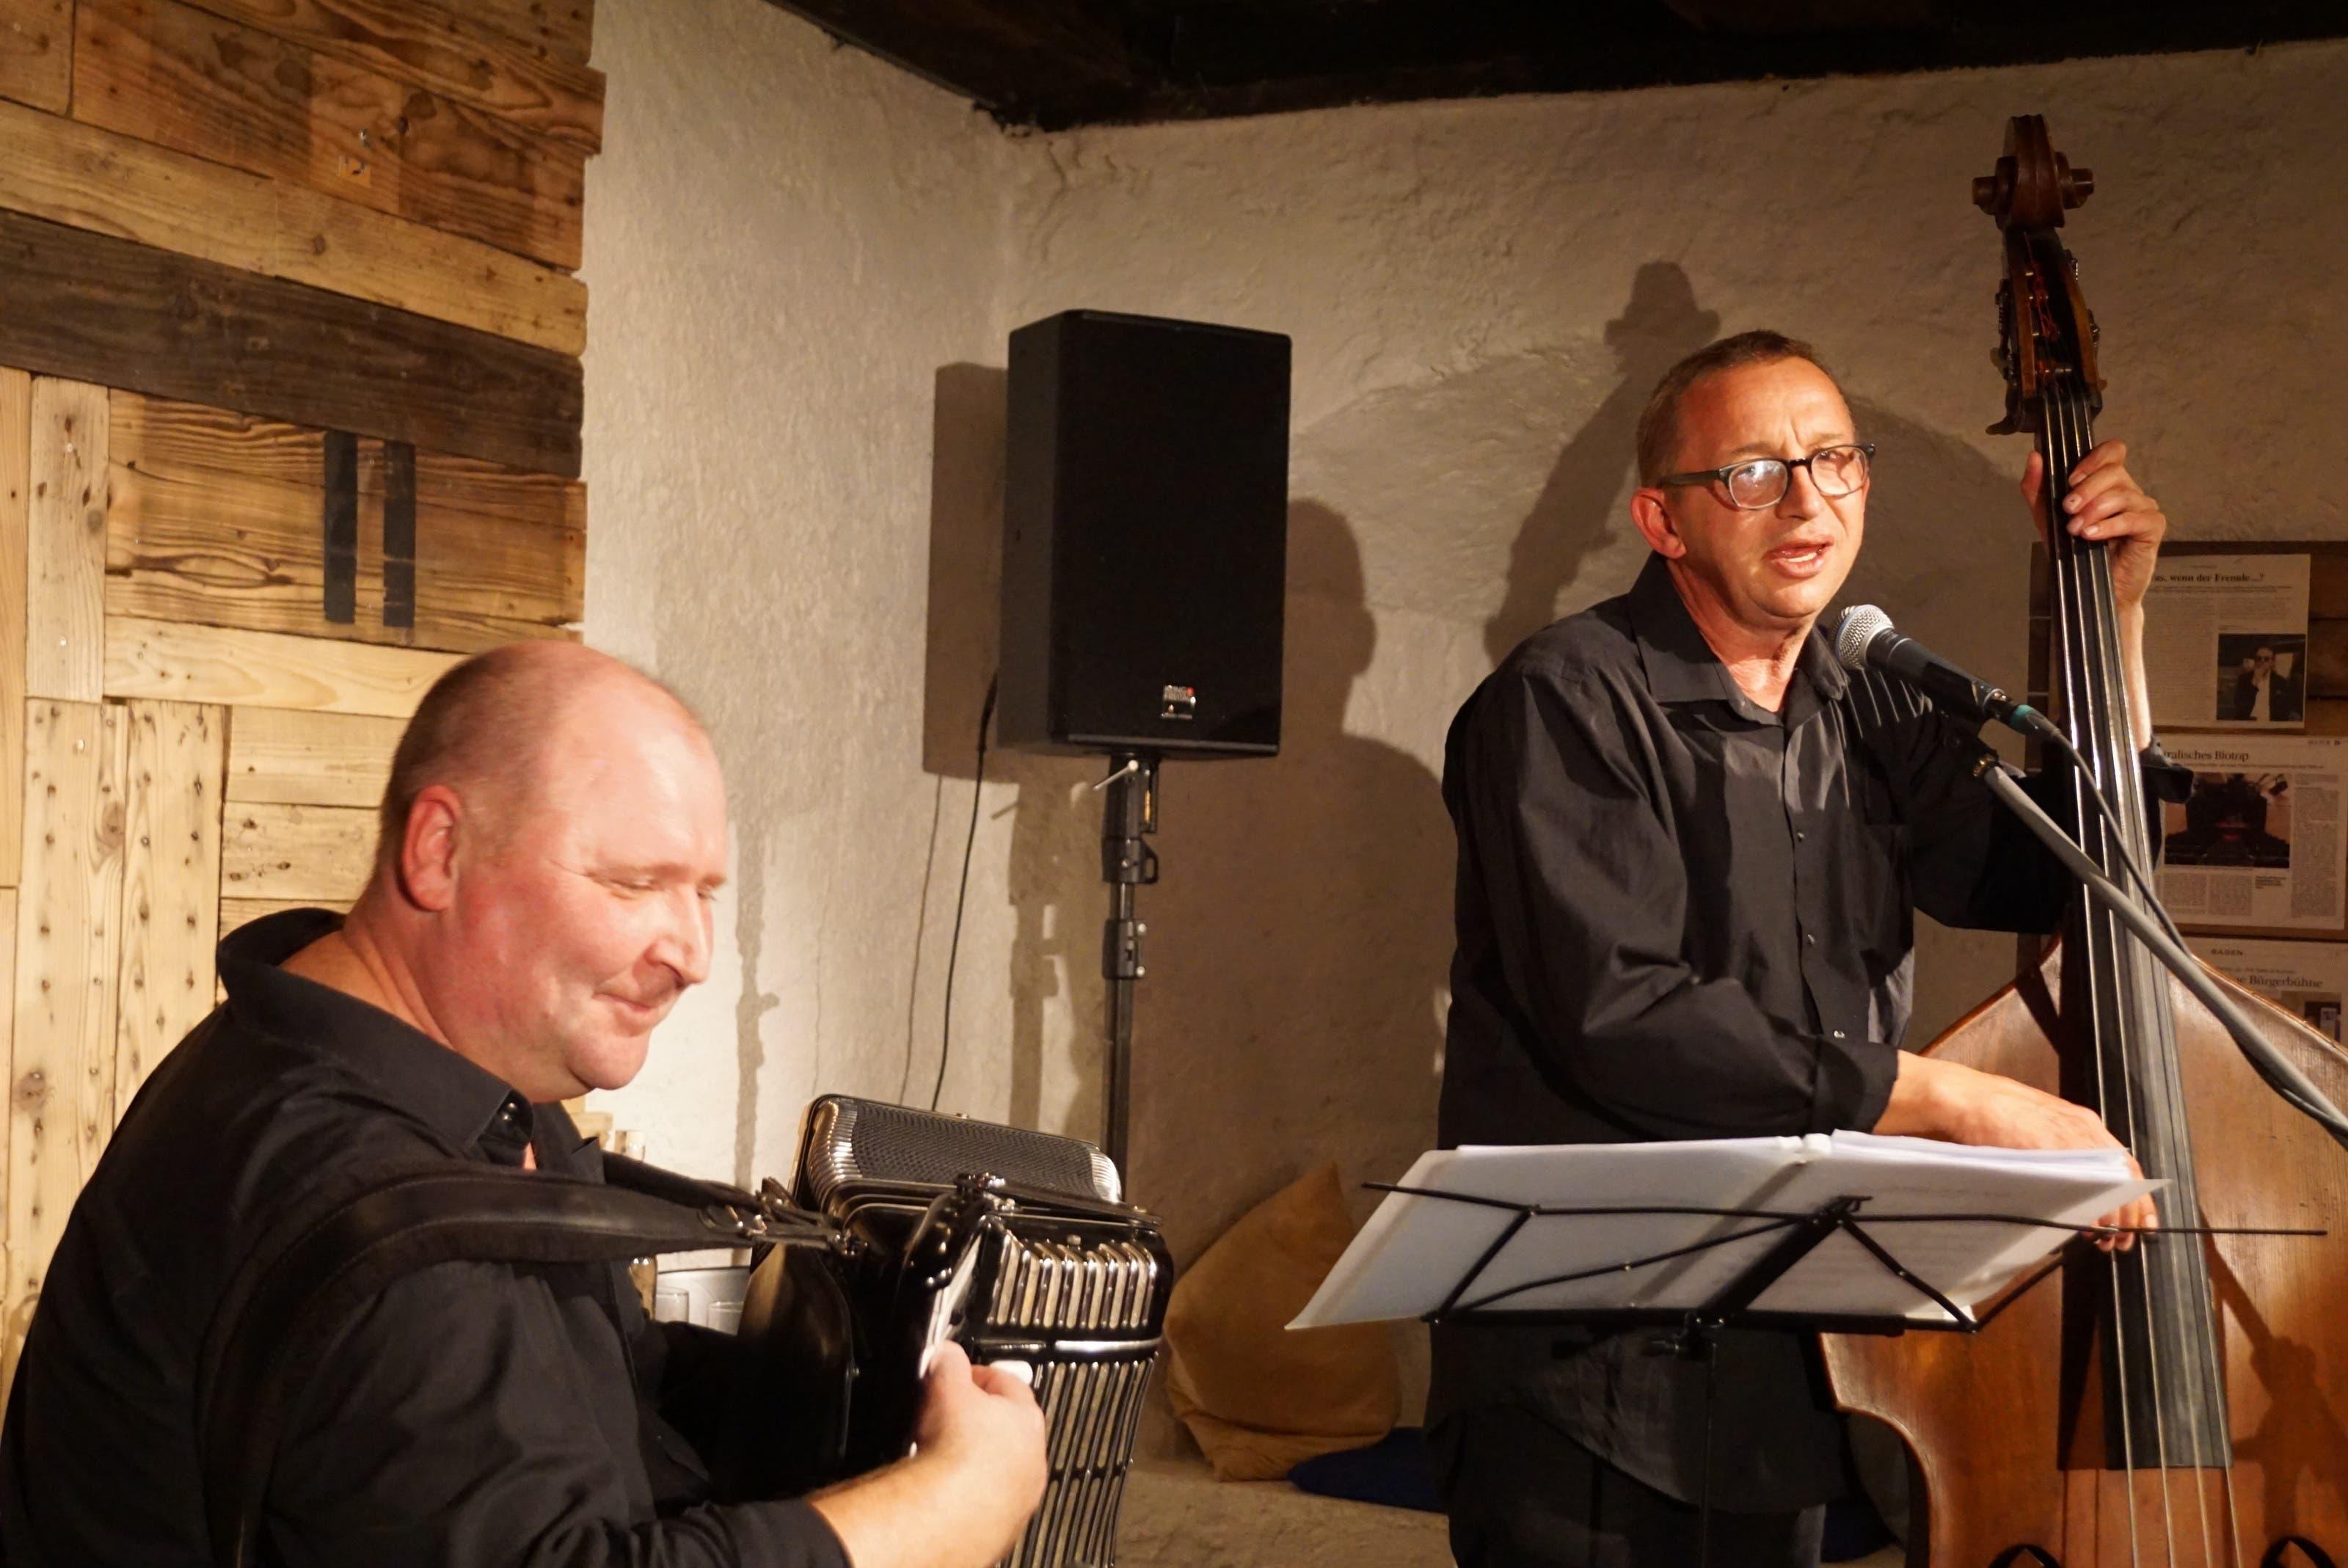 Oleg Lips (links) am Akkordeon und Philipp Galizia am Kontrabass...